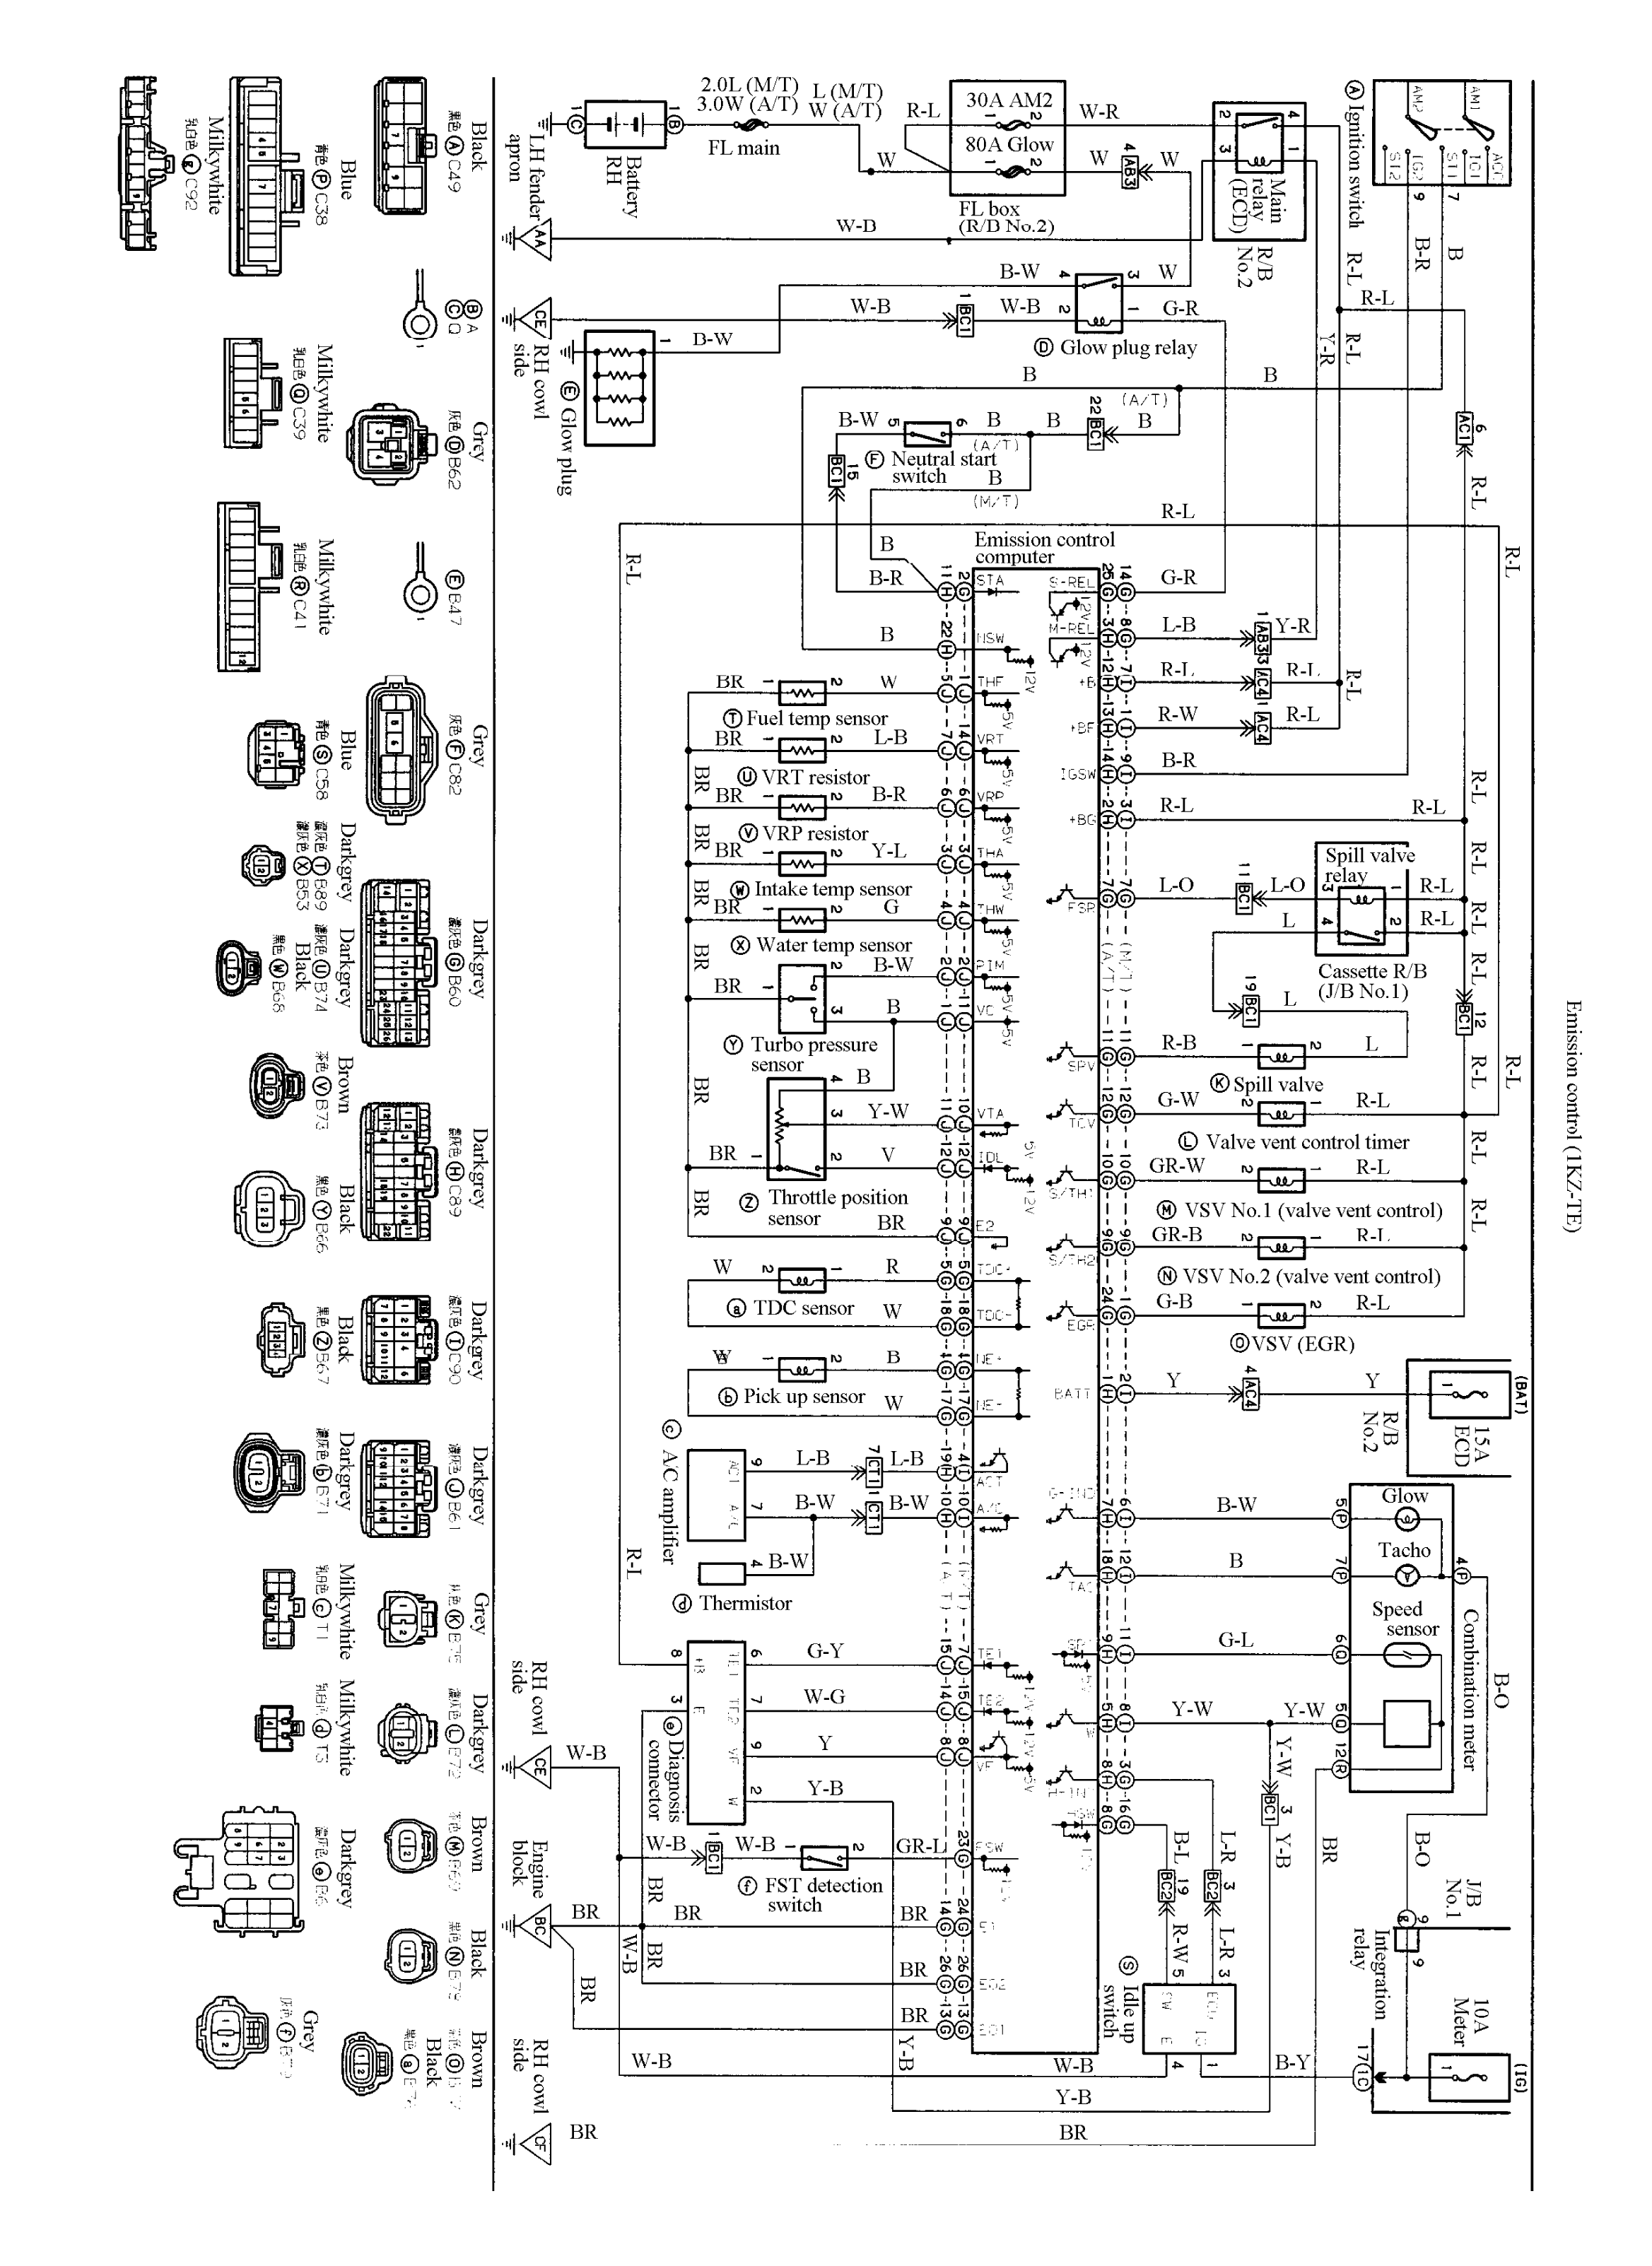 2005 Honda Accord Ecu Wiring Diagram